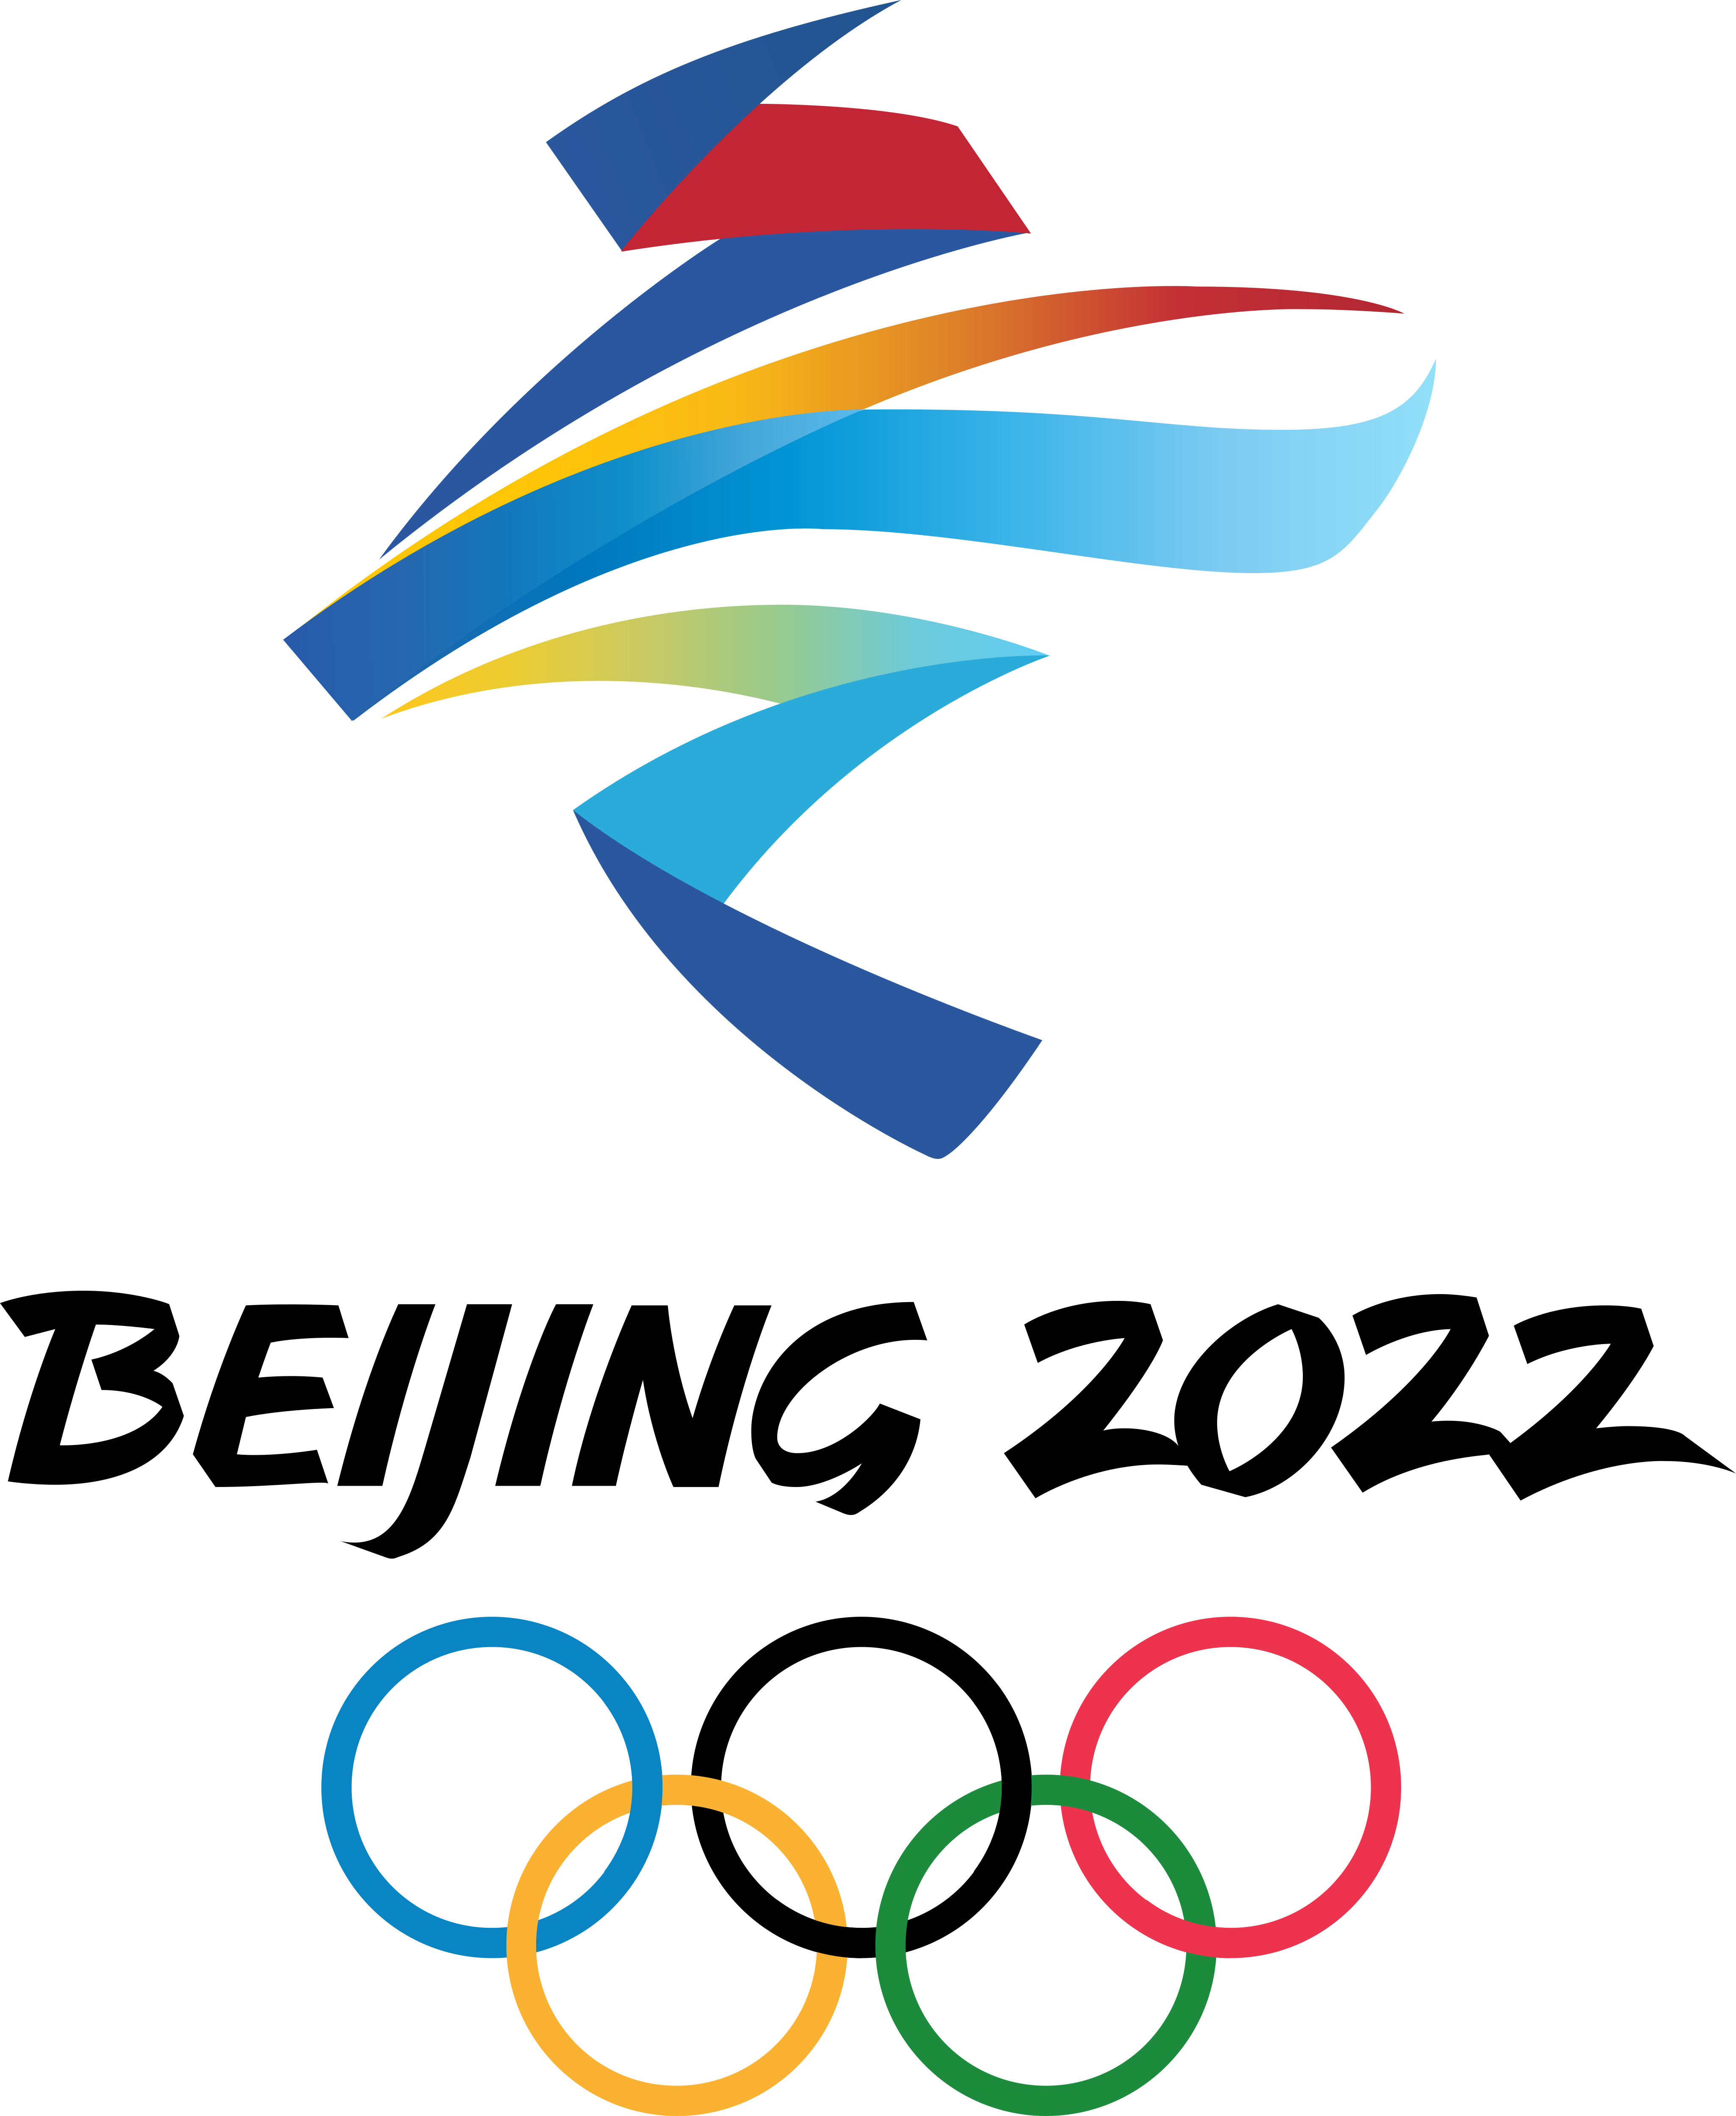 beijing 2022 logo - Beijing 2022 Logo